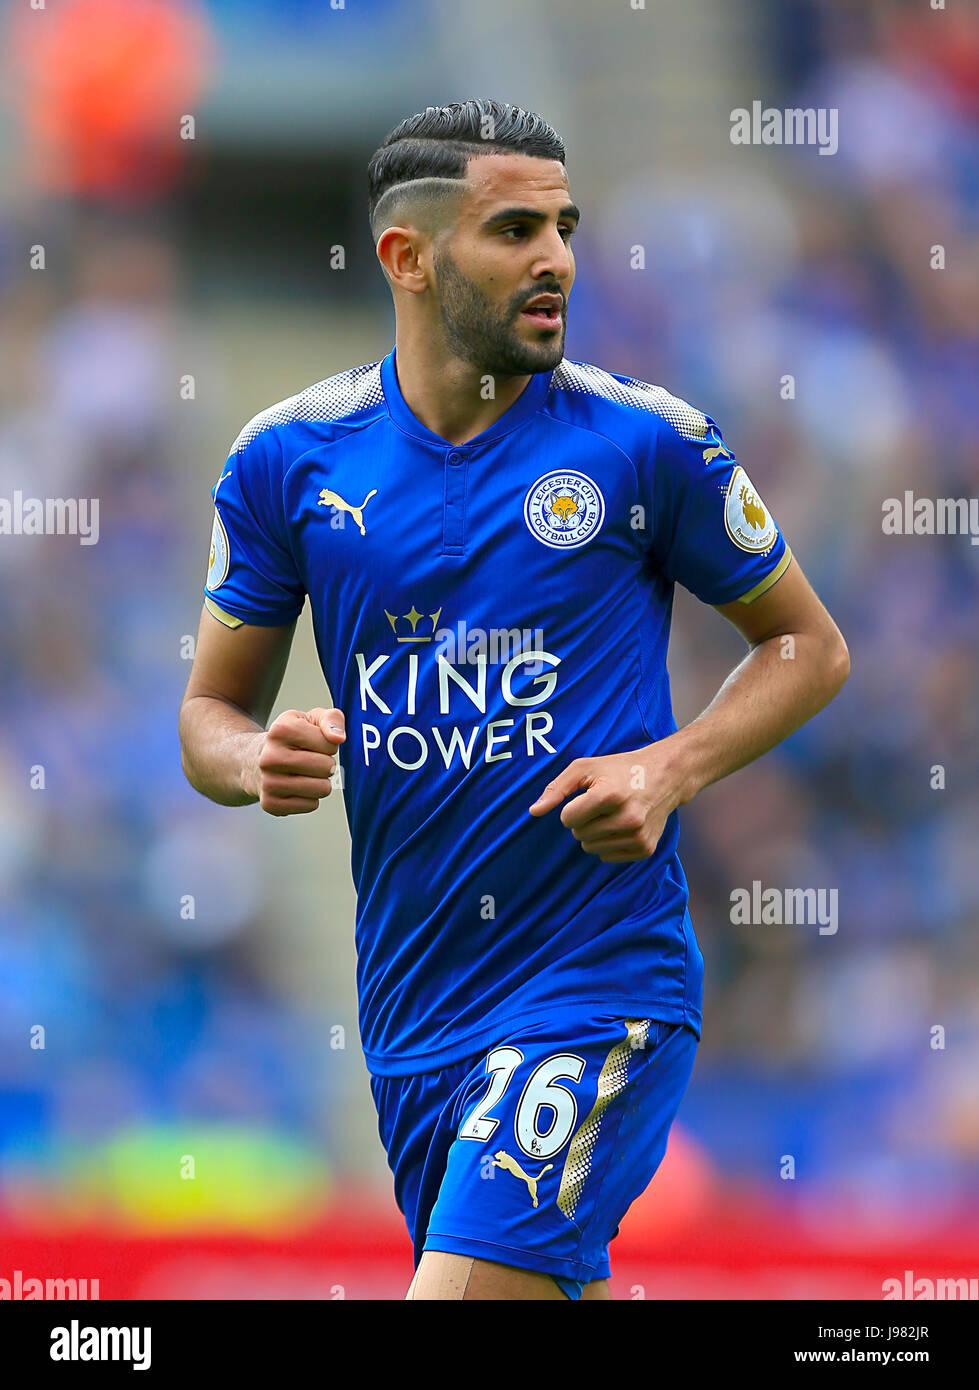 Riyad Mahrez Leicester City Stock Royalty Free Image